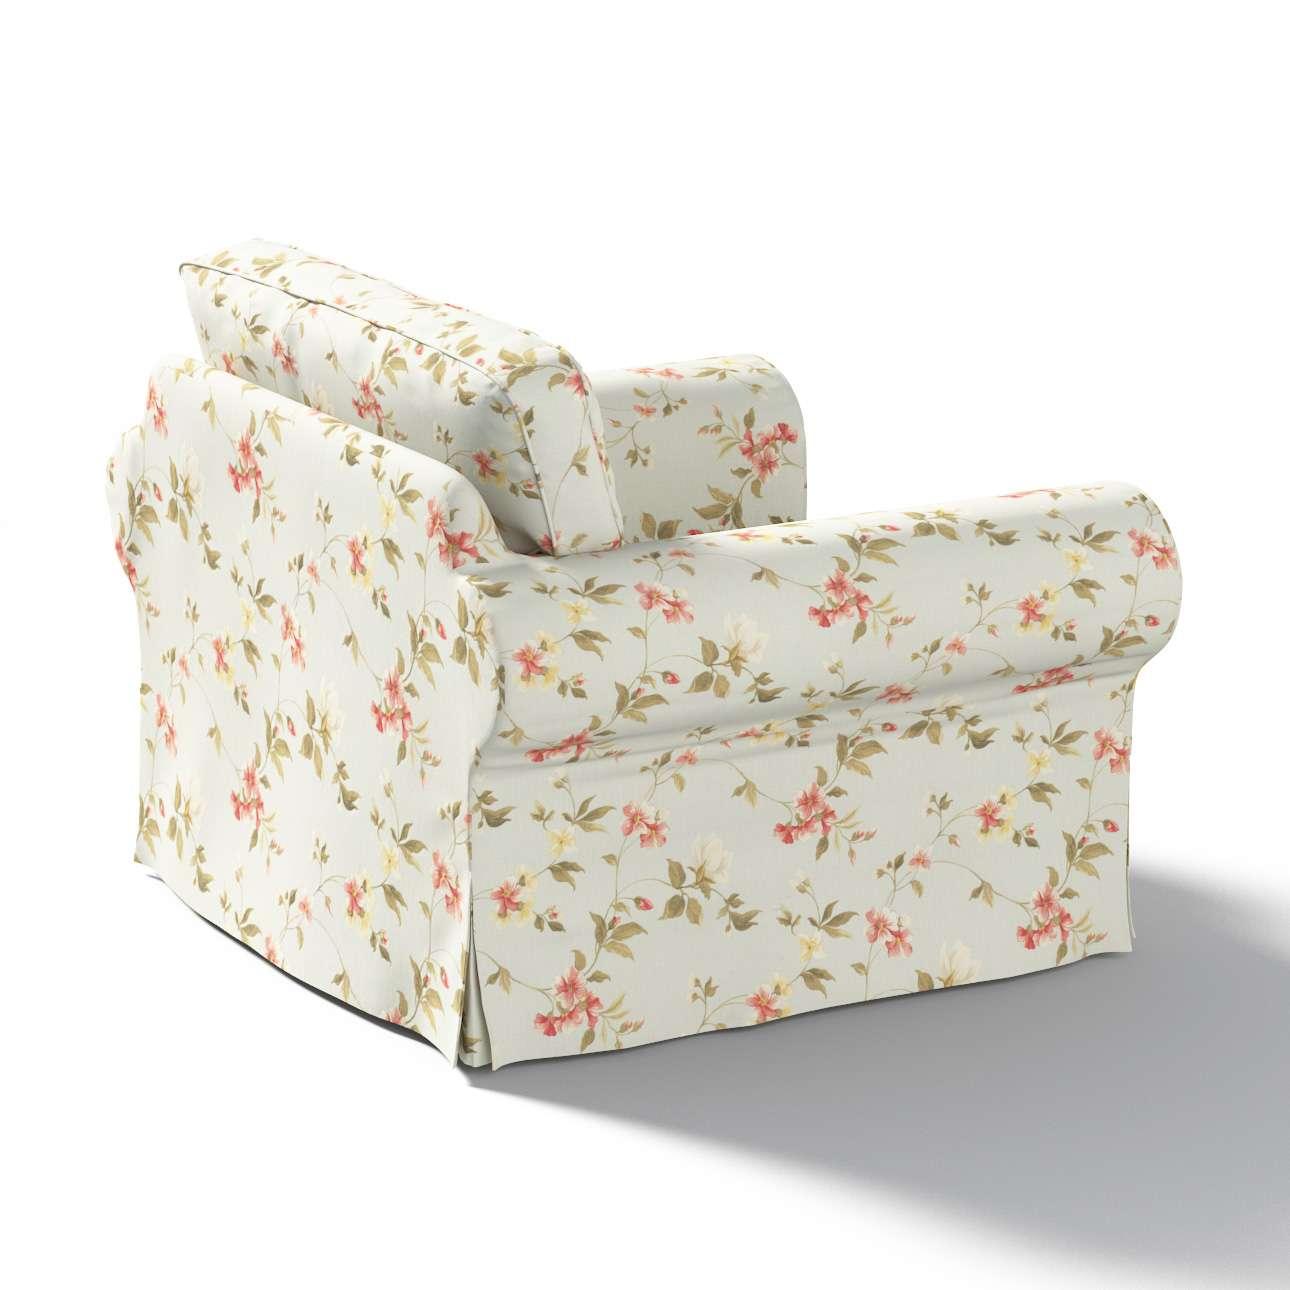 Ektorp Sesselbezug Sesselhusse, Ektorp Sessel von der Kollektion Londres, Stoff: 124-65